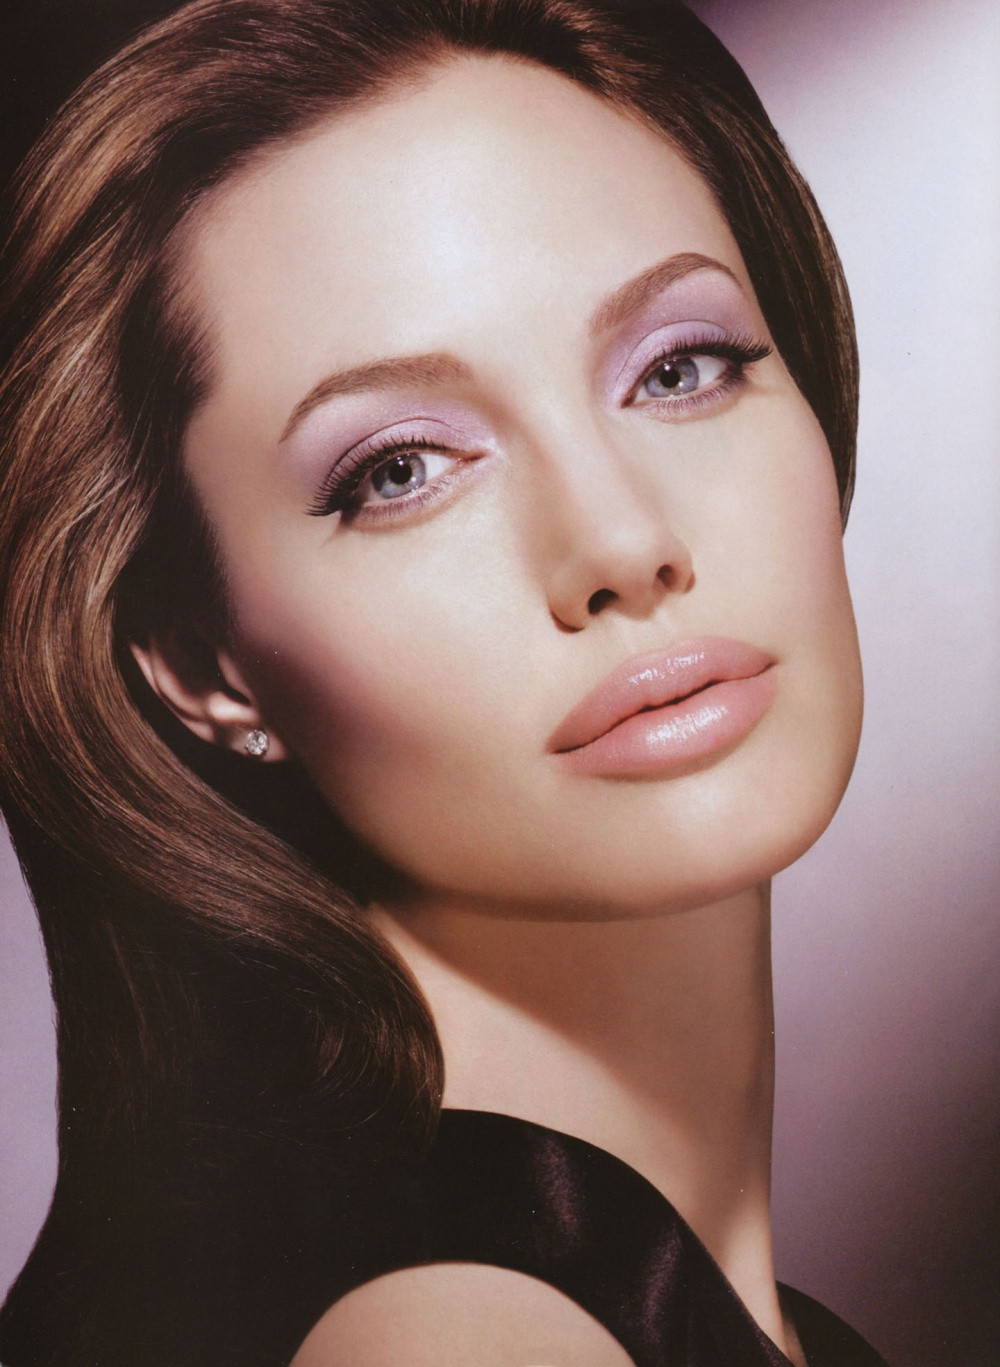 Фото: Анджелина Джоли / Кадр из «Анджелина Джоли» (1975 ... анджелина джоли